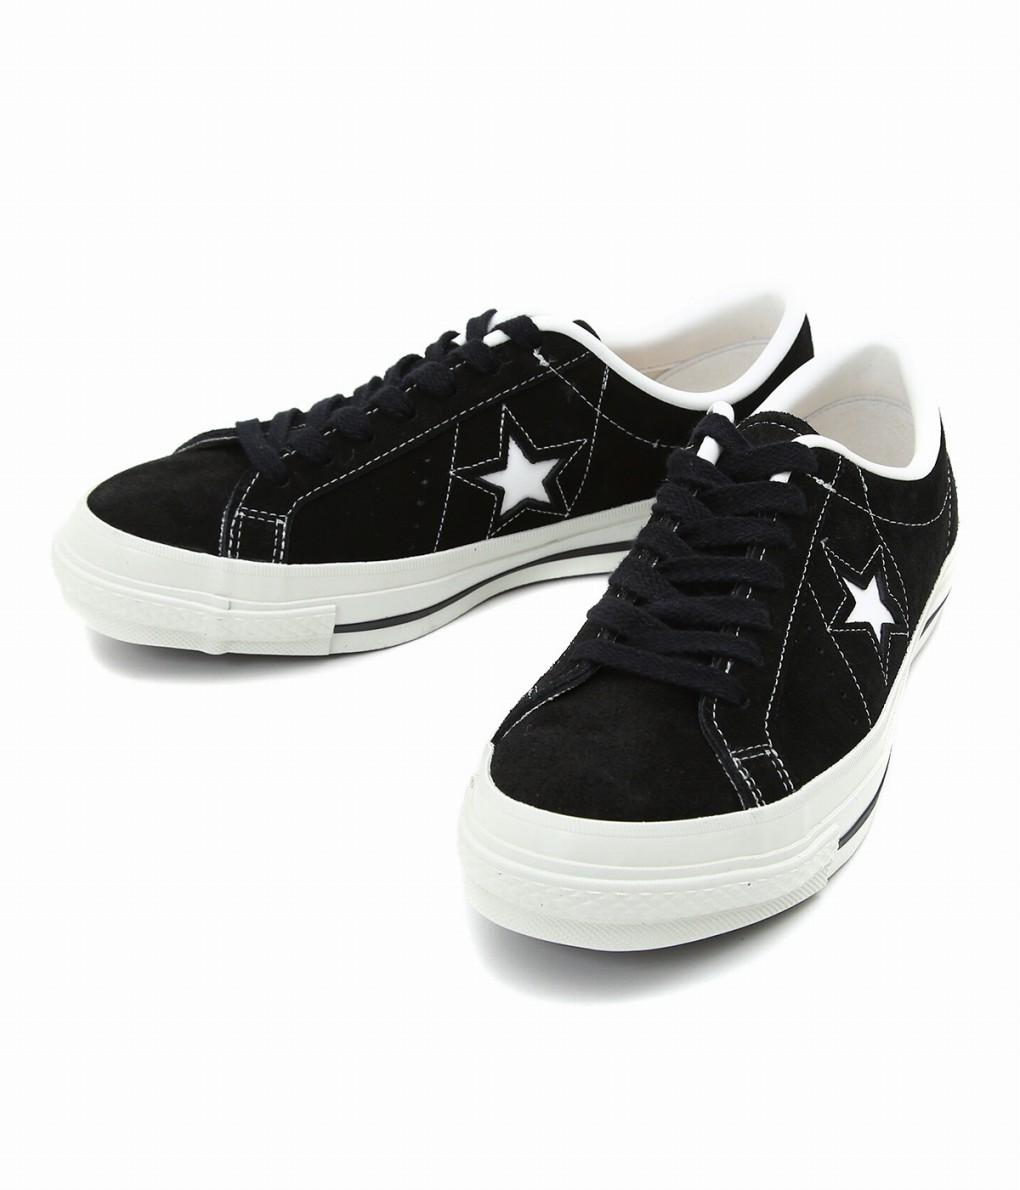 CONVERSE / コンバース : ONE STAR J SUEDE : コンバース ワンスター シューズ 靴 スニーカー メンズ : 32356911【STA】【WIS】